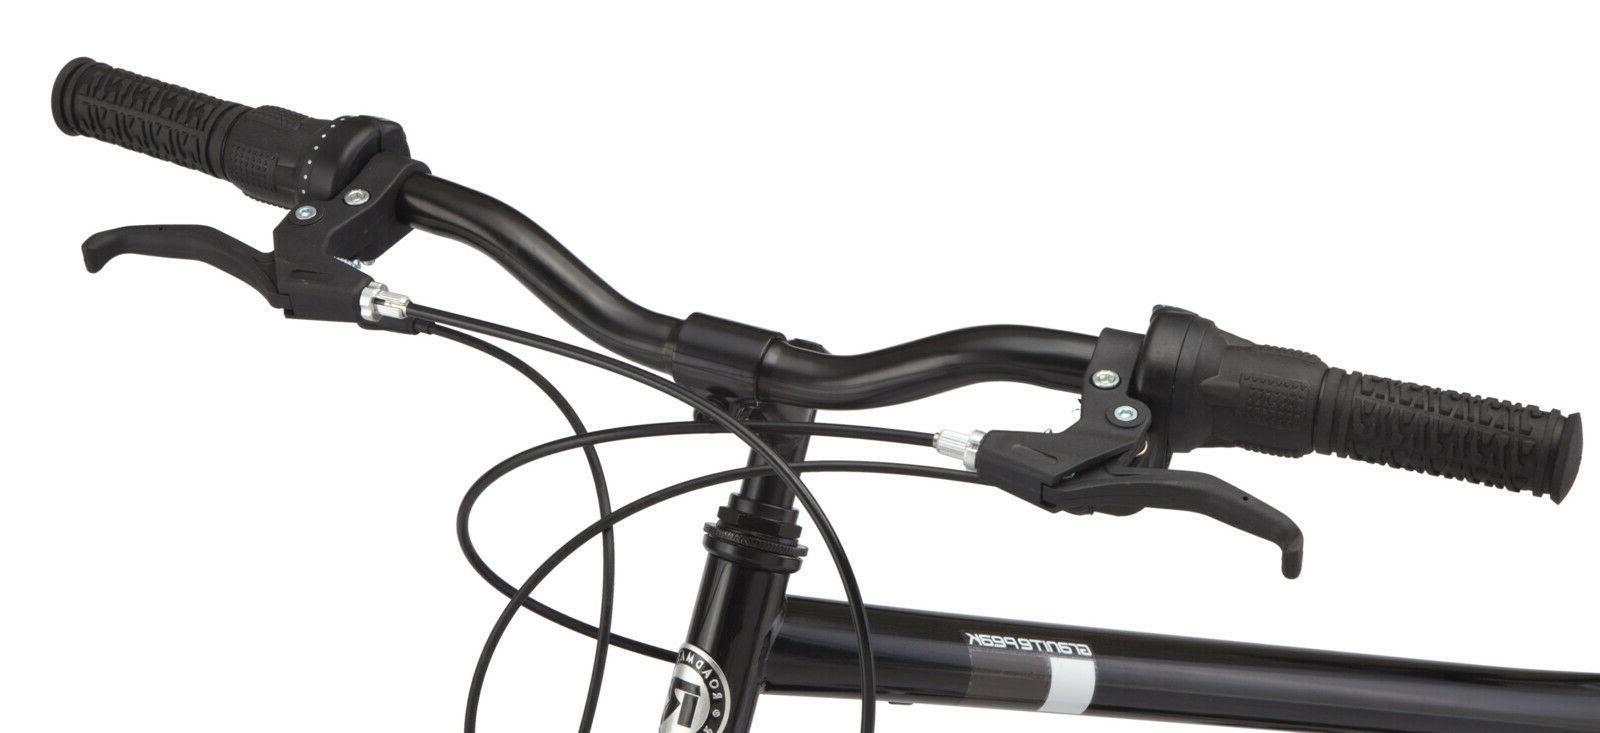 Roadmaster Peak Mountain Bike for Men Black